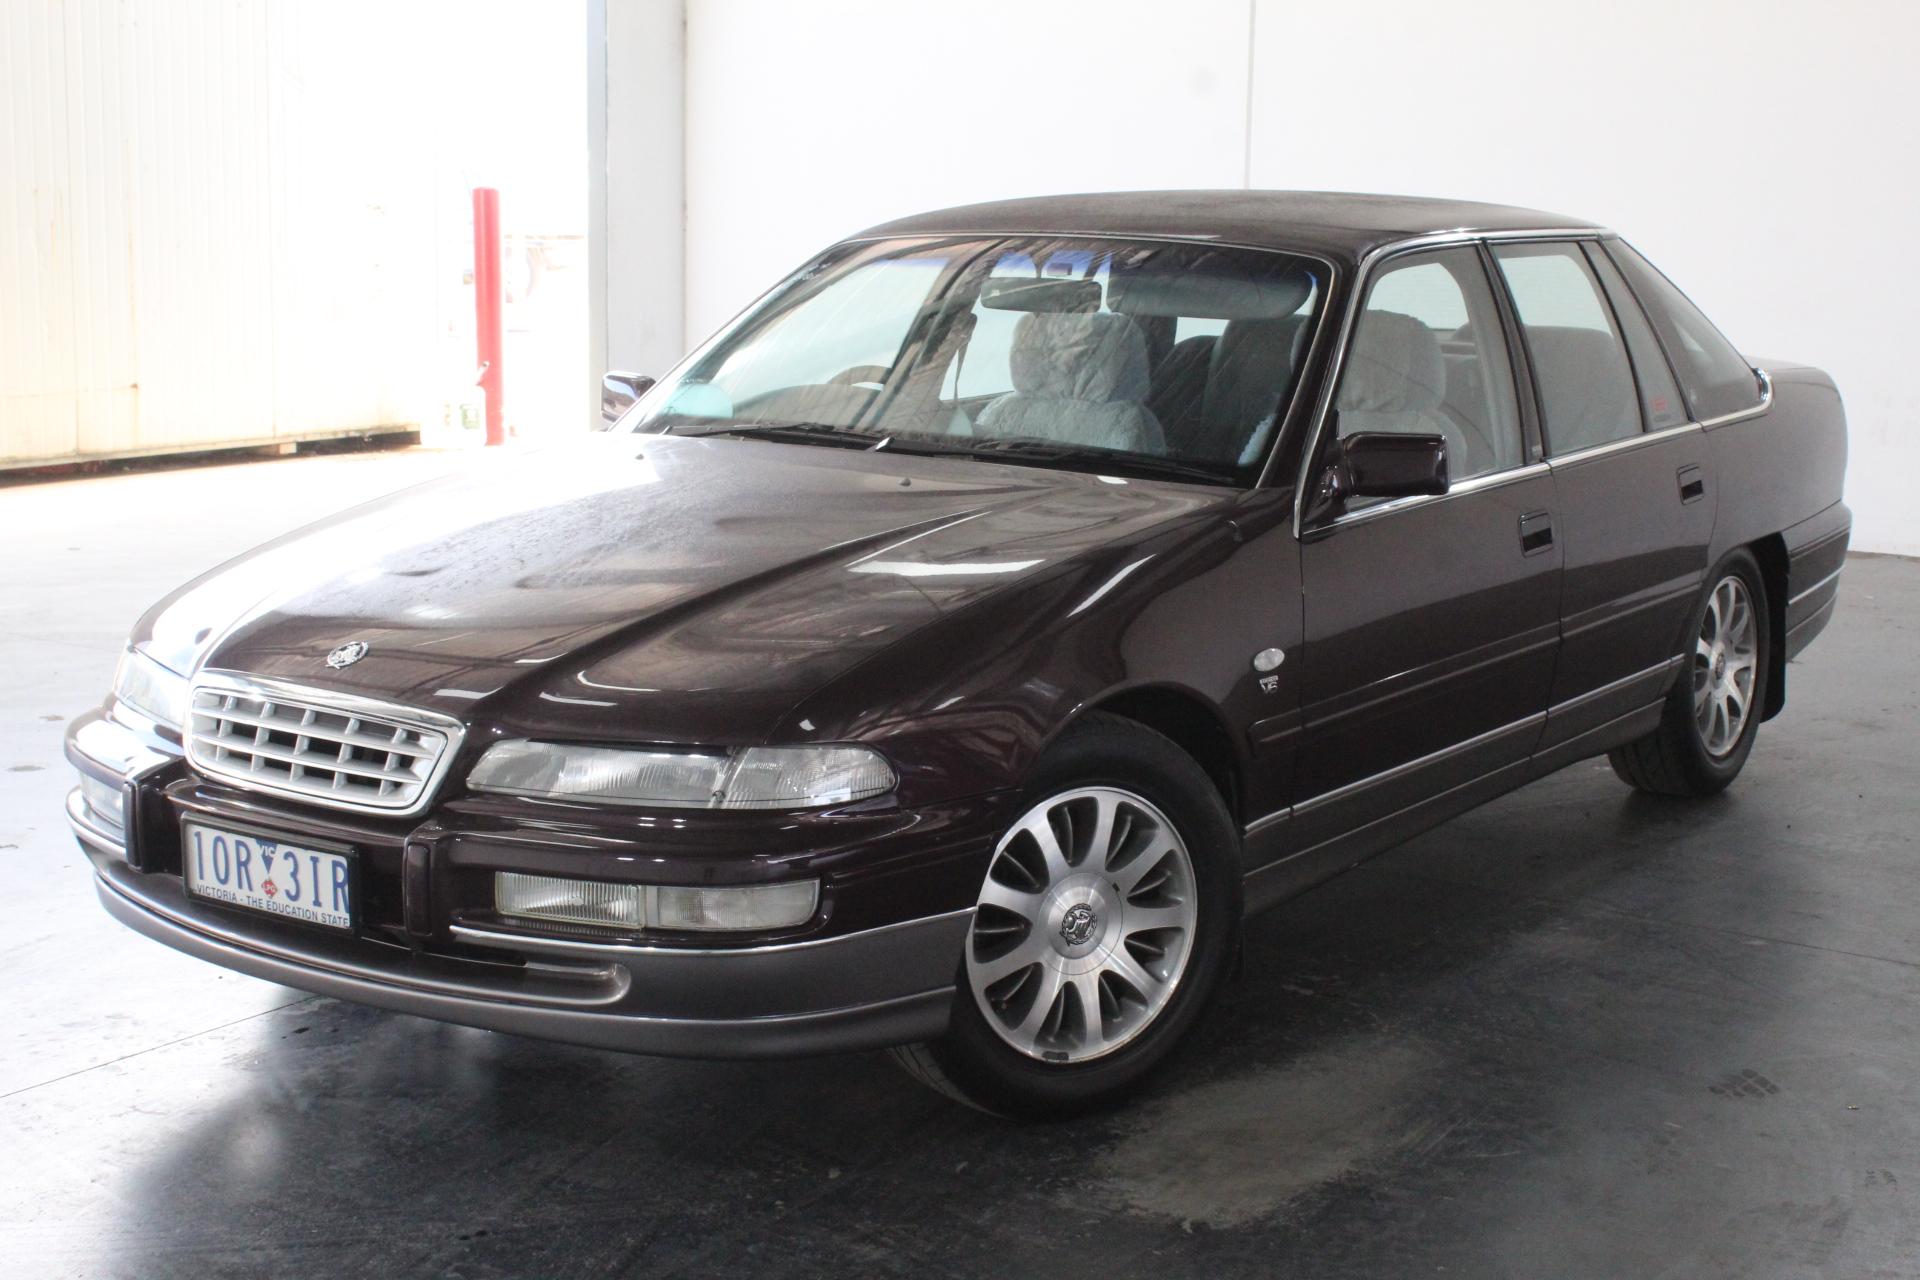 1999 Holden Statesman V6 VS Automatic Sedan